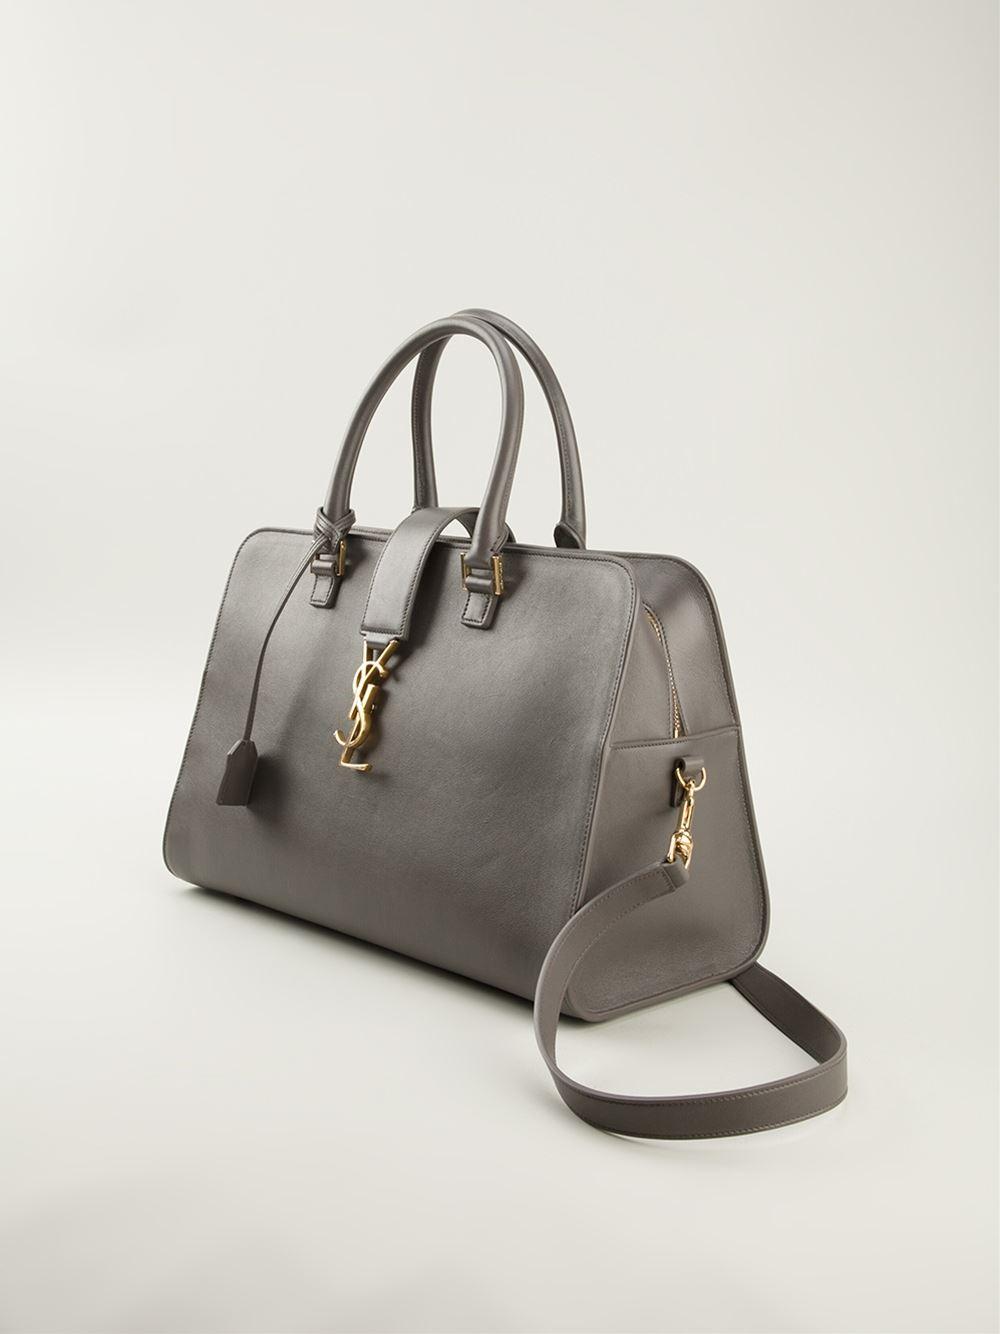 yve saint laurent purses - monogram small zip-around satchel bag, gray